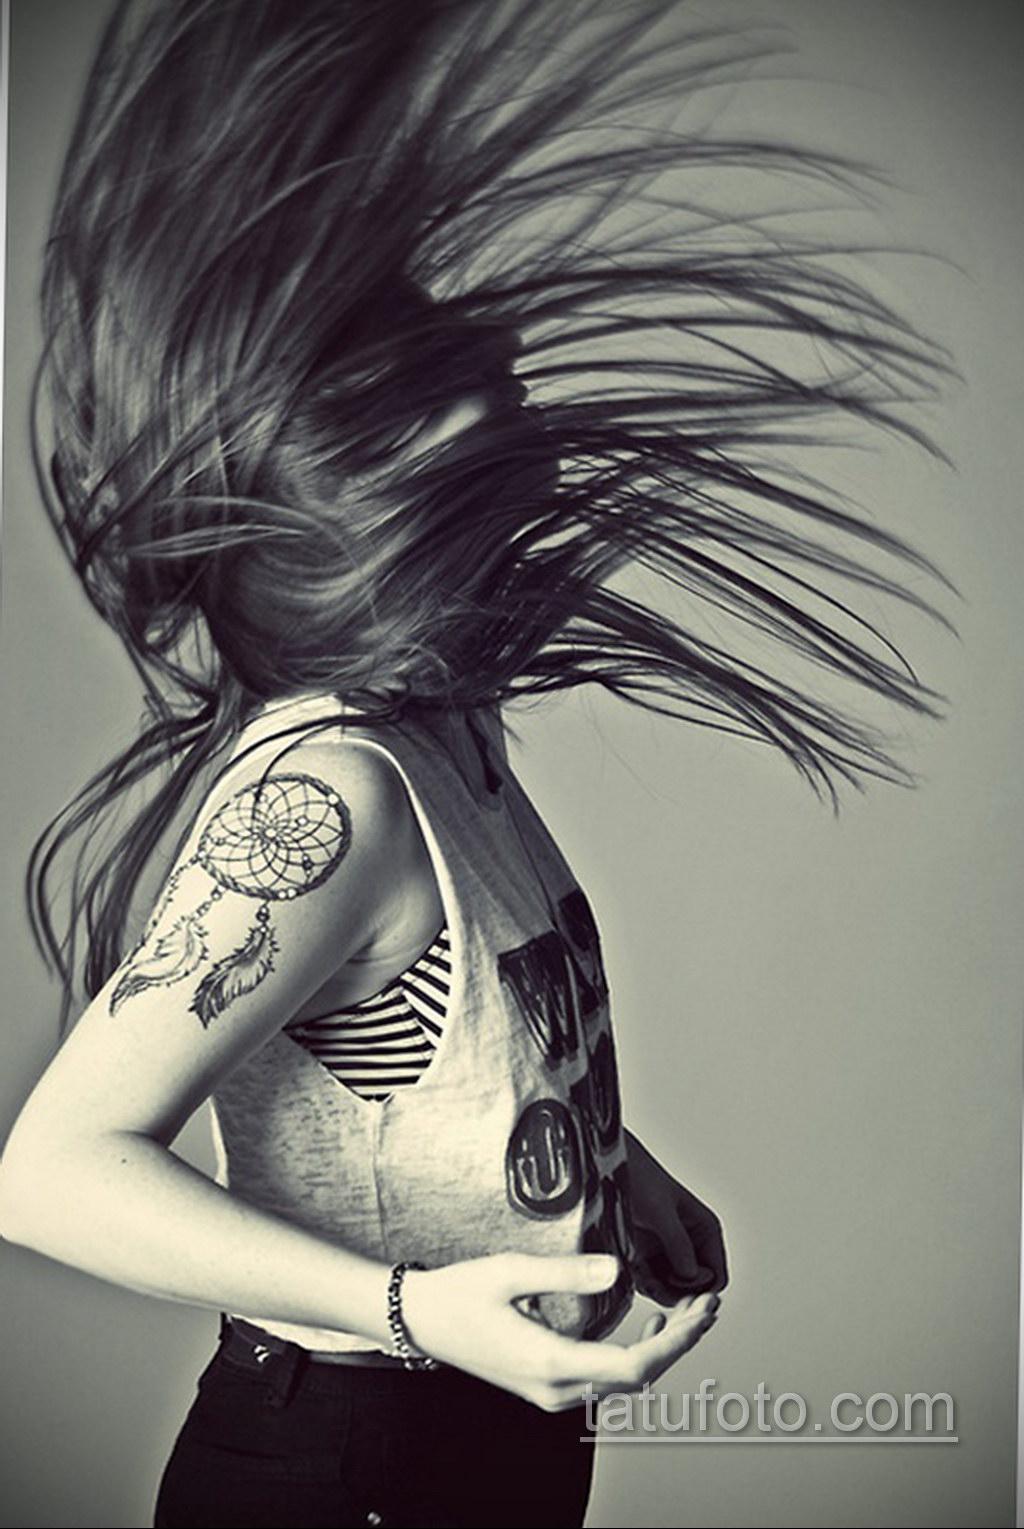 Фото рисунка тату с ловцом снов 22.11.2020 №589 -Dreamcatcher tattoo- tatufoto.com